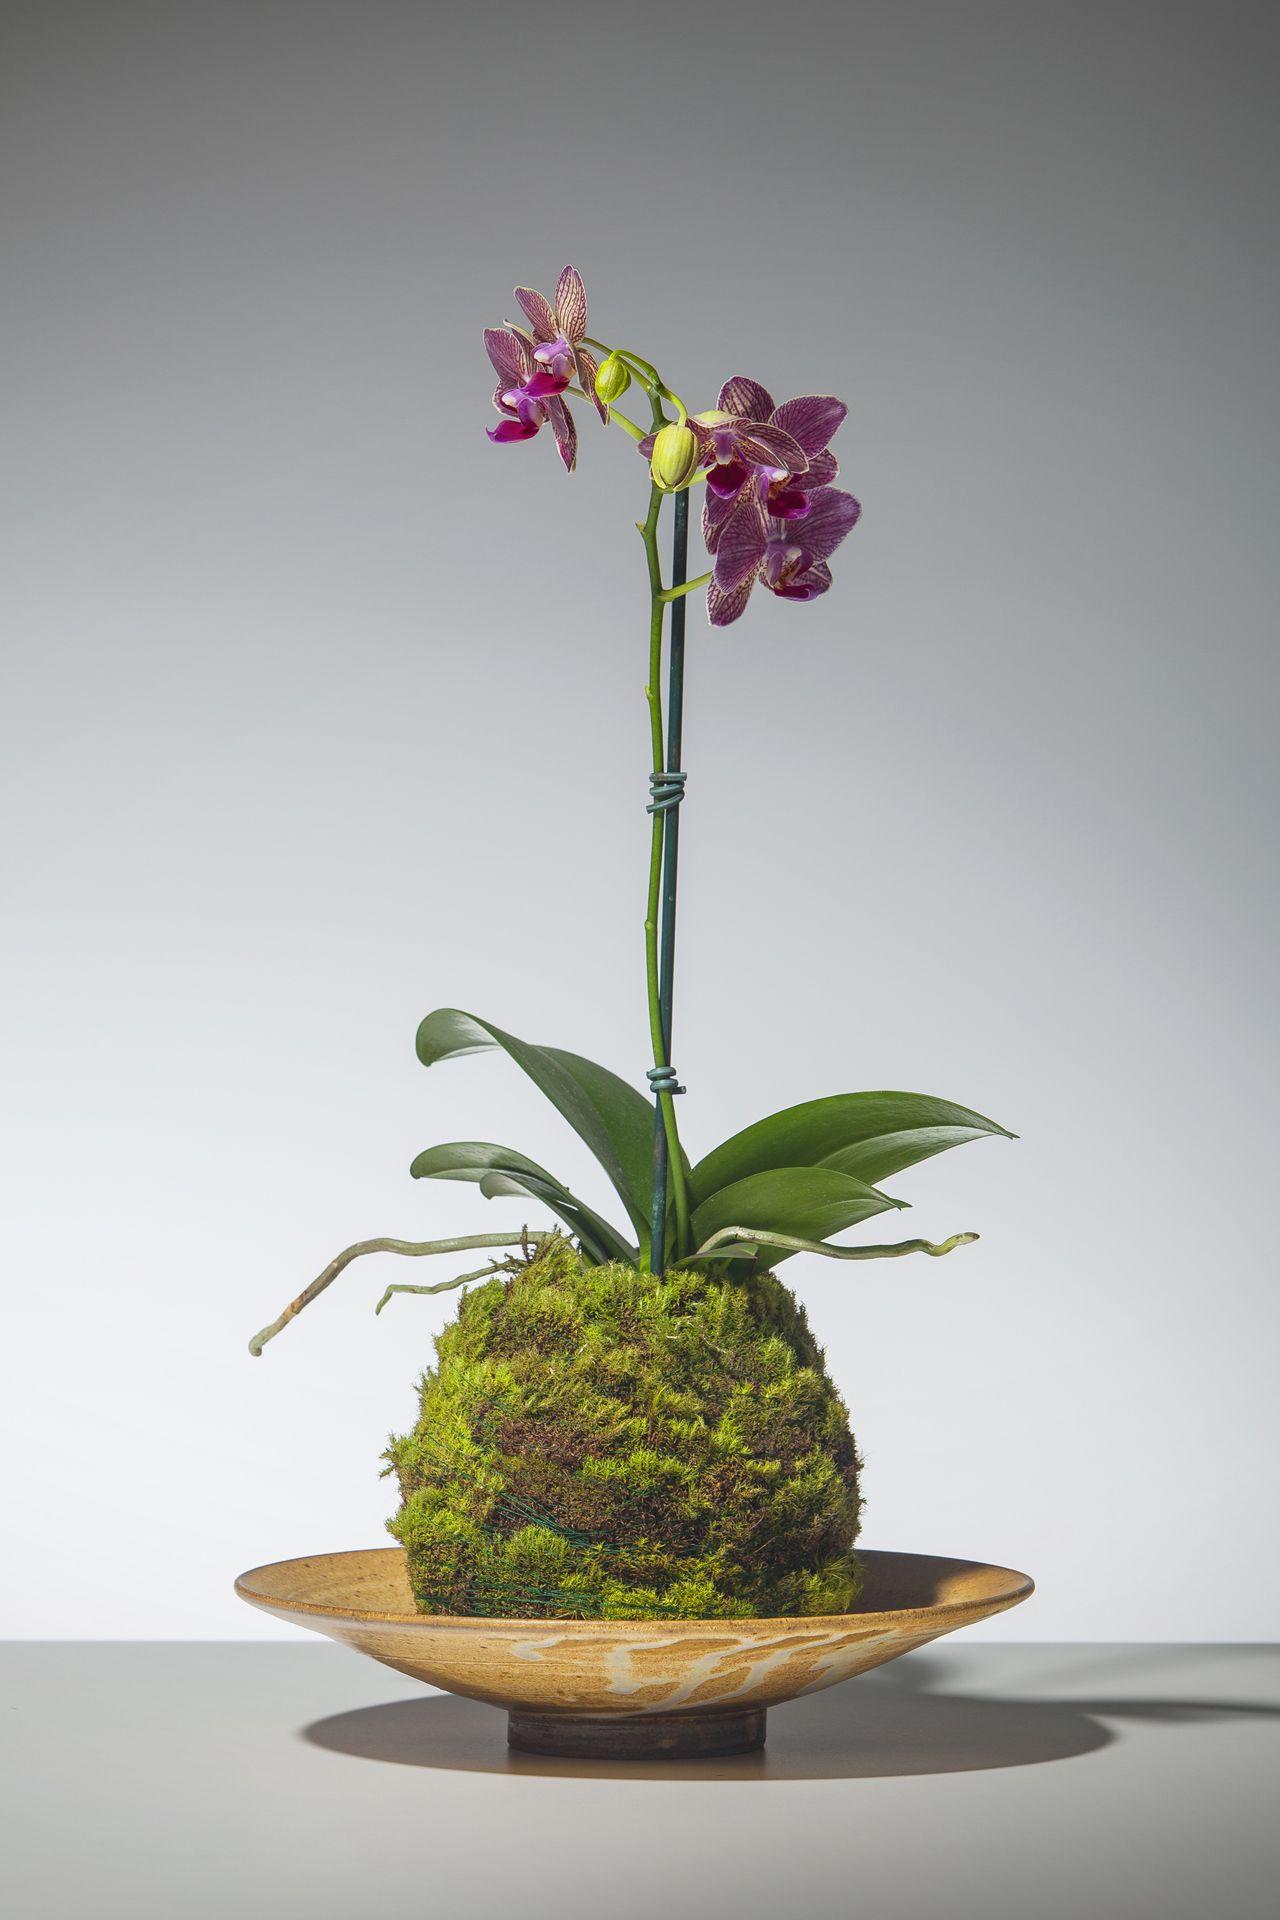 kokedama de orqu dea phalaenopsis kokedama orquidea orchild musgo moss artebotanica. Black Bedroom Furniture Sets. Home Design Ideas